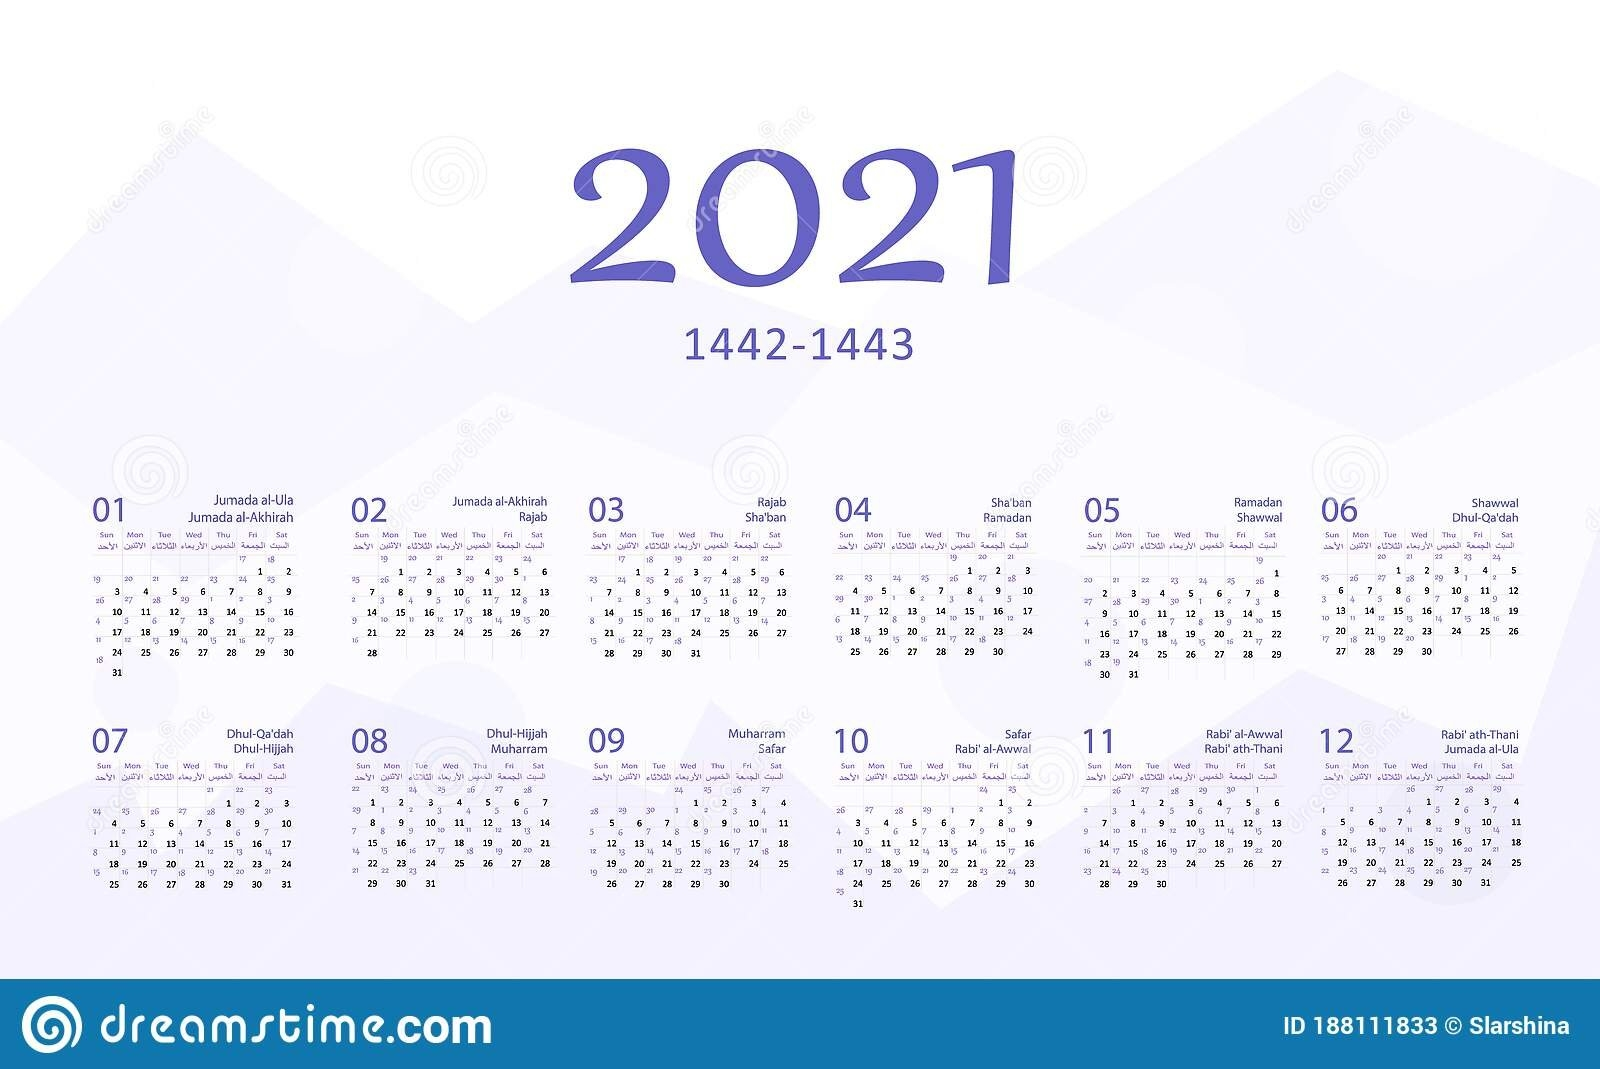 2021 Islamic Calendar - Holiday Calendar regarding Pakistan 2021 Photo Calendar Graphics